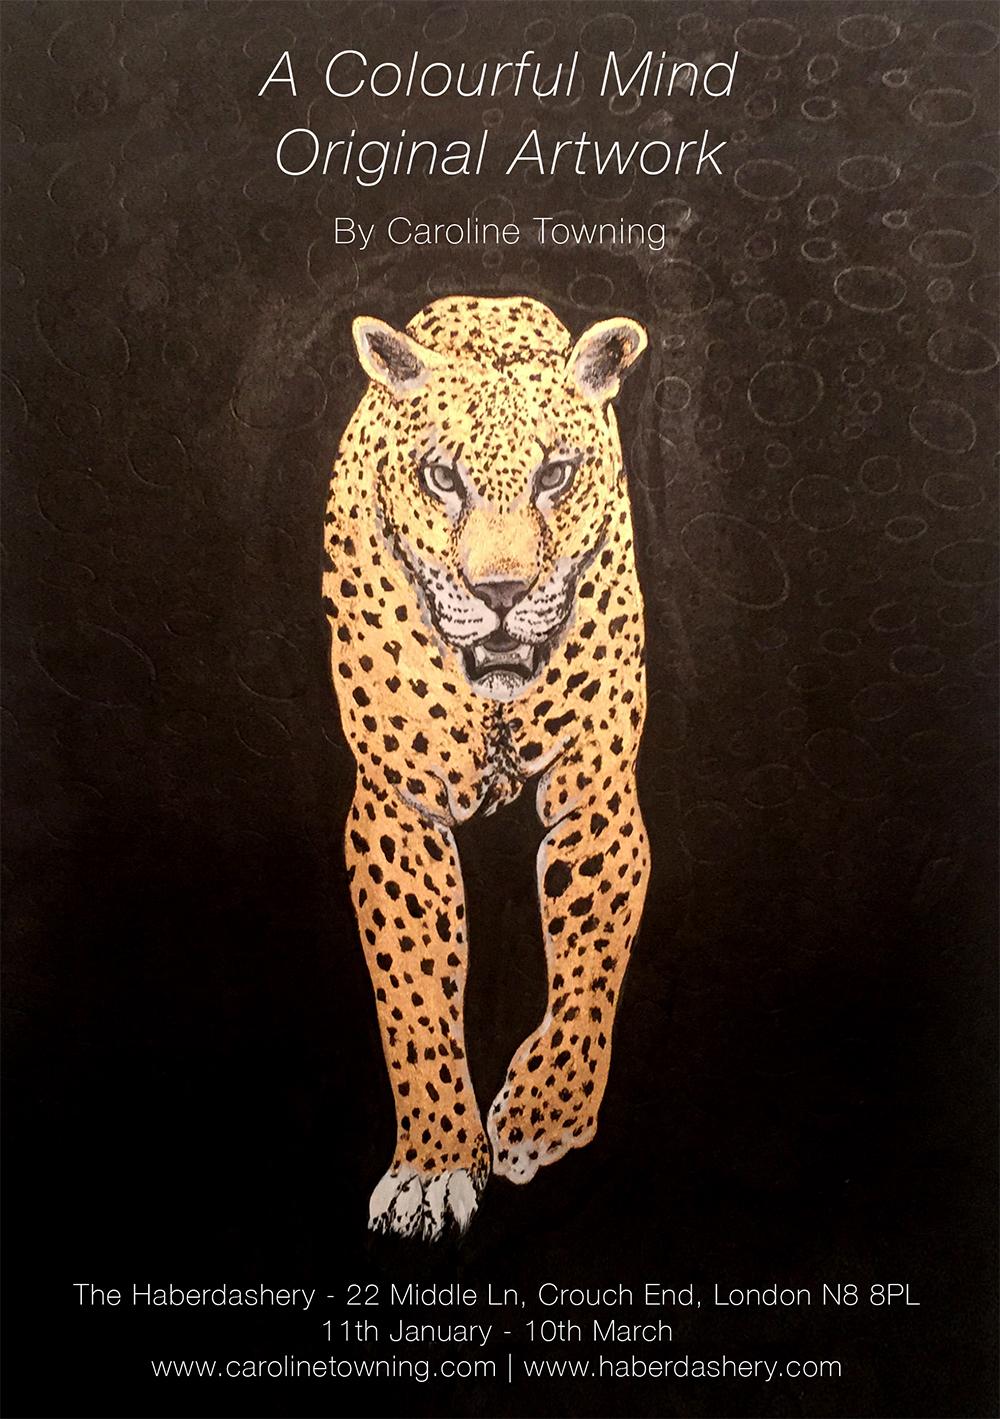 Leopard Caroline Towning Exhibition